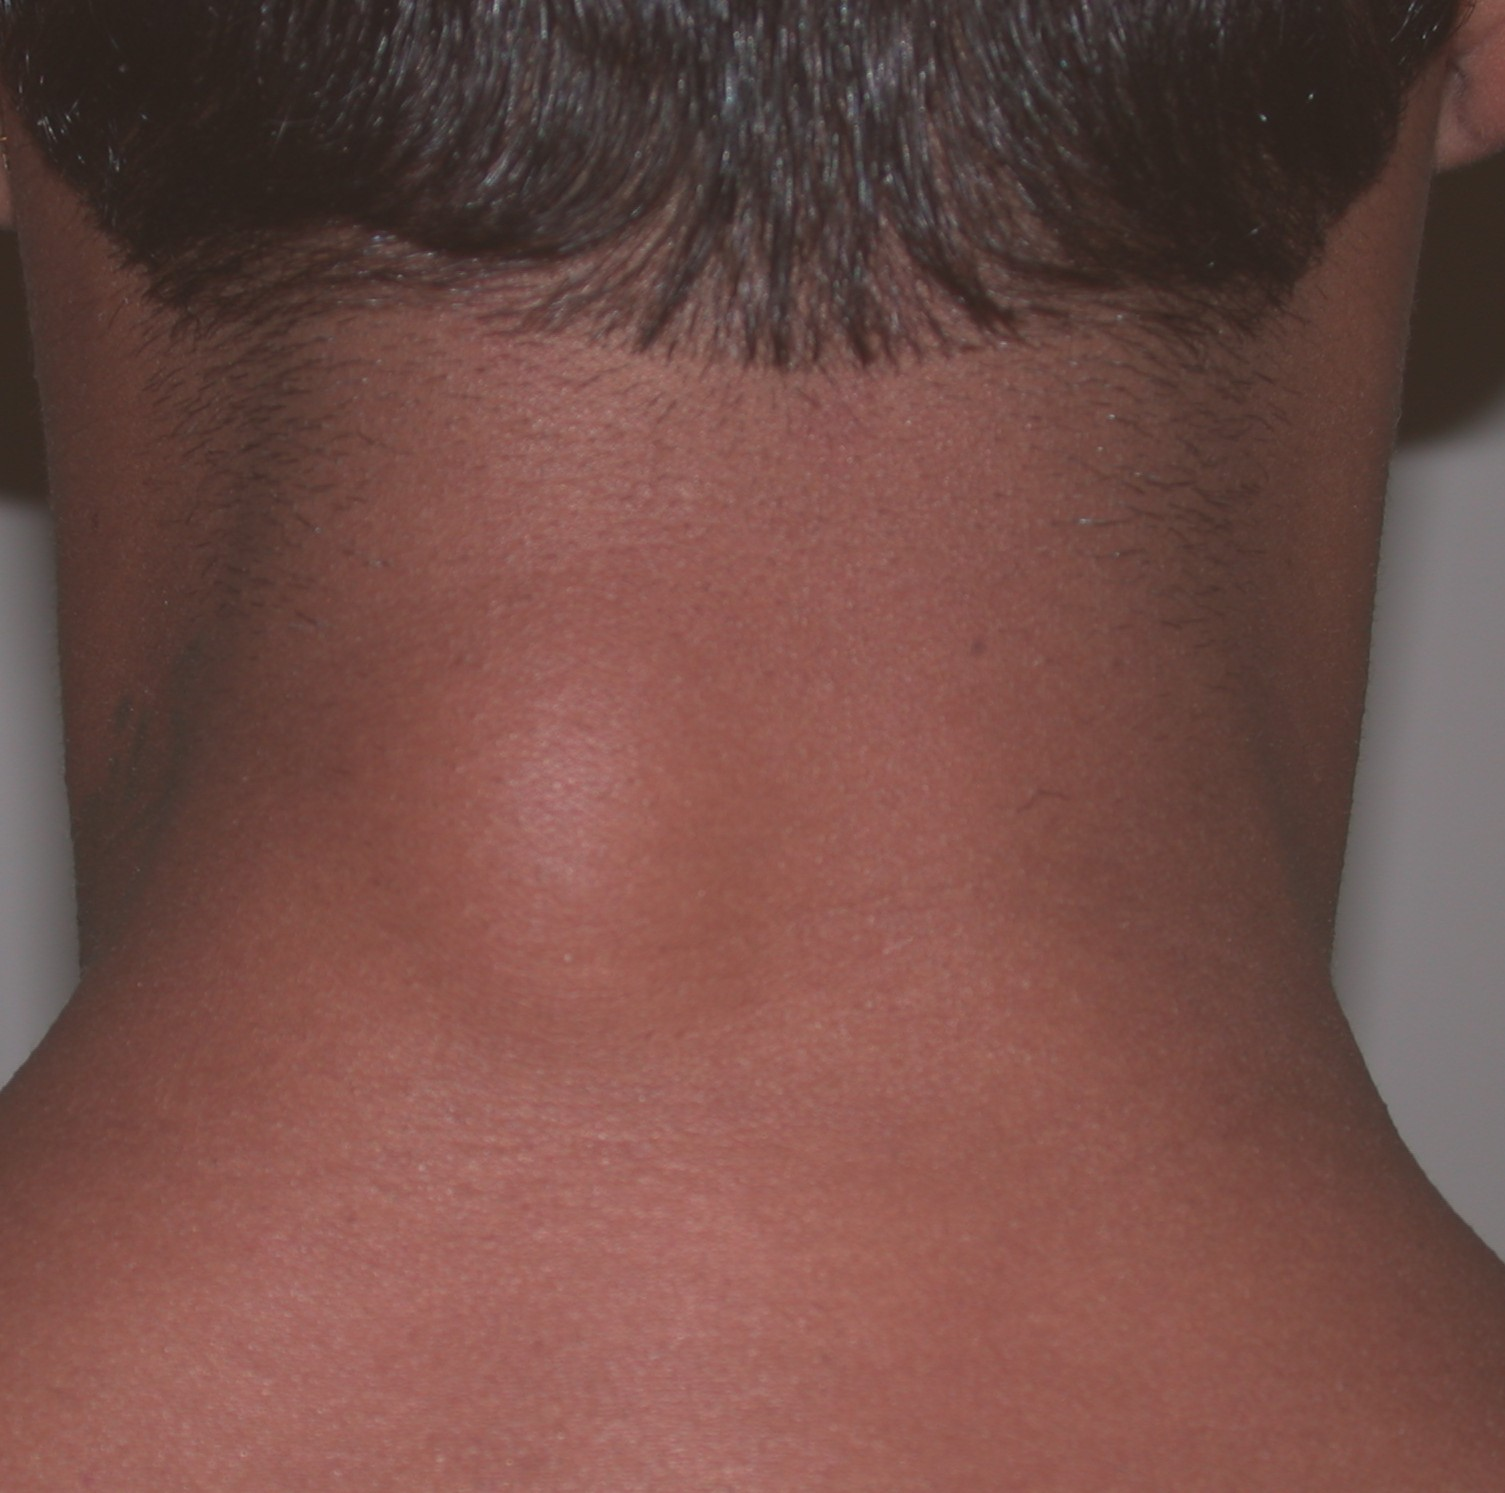 Lipoma (Skin Lumps): Causes, Diagnosis and Treatments